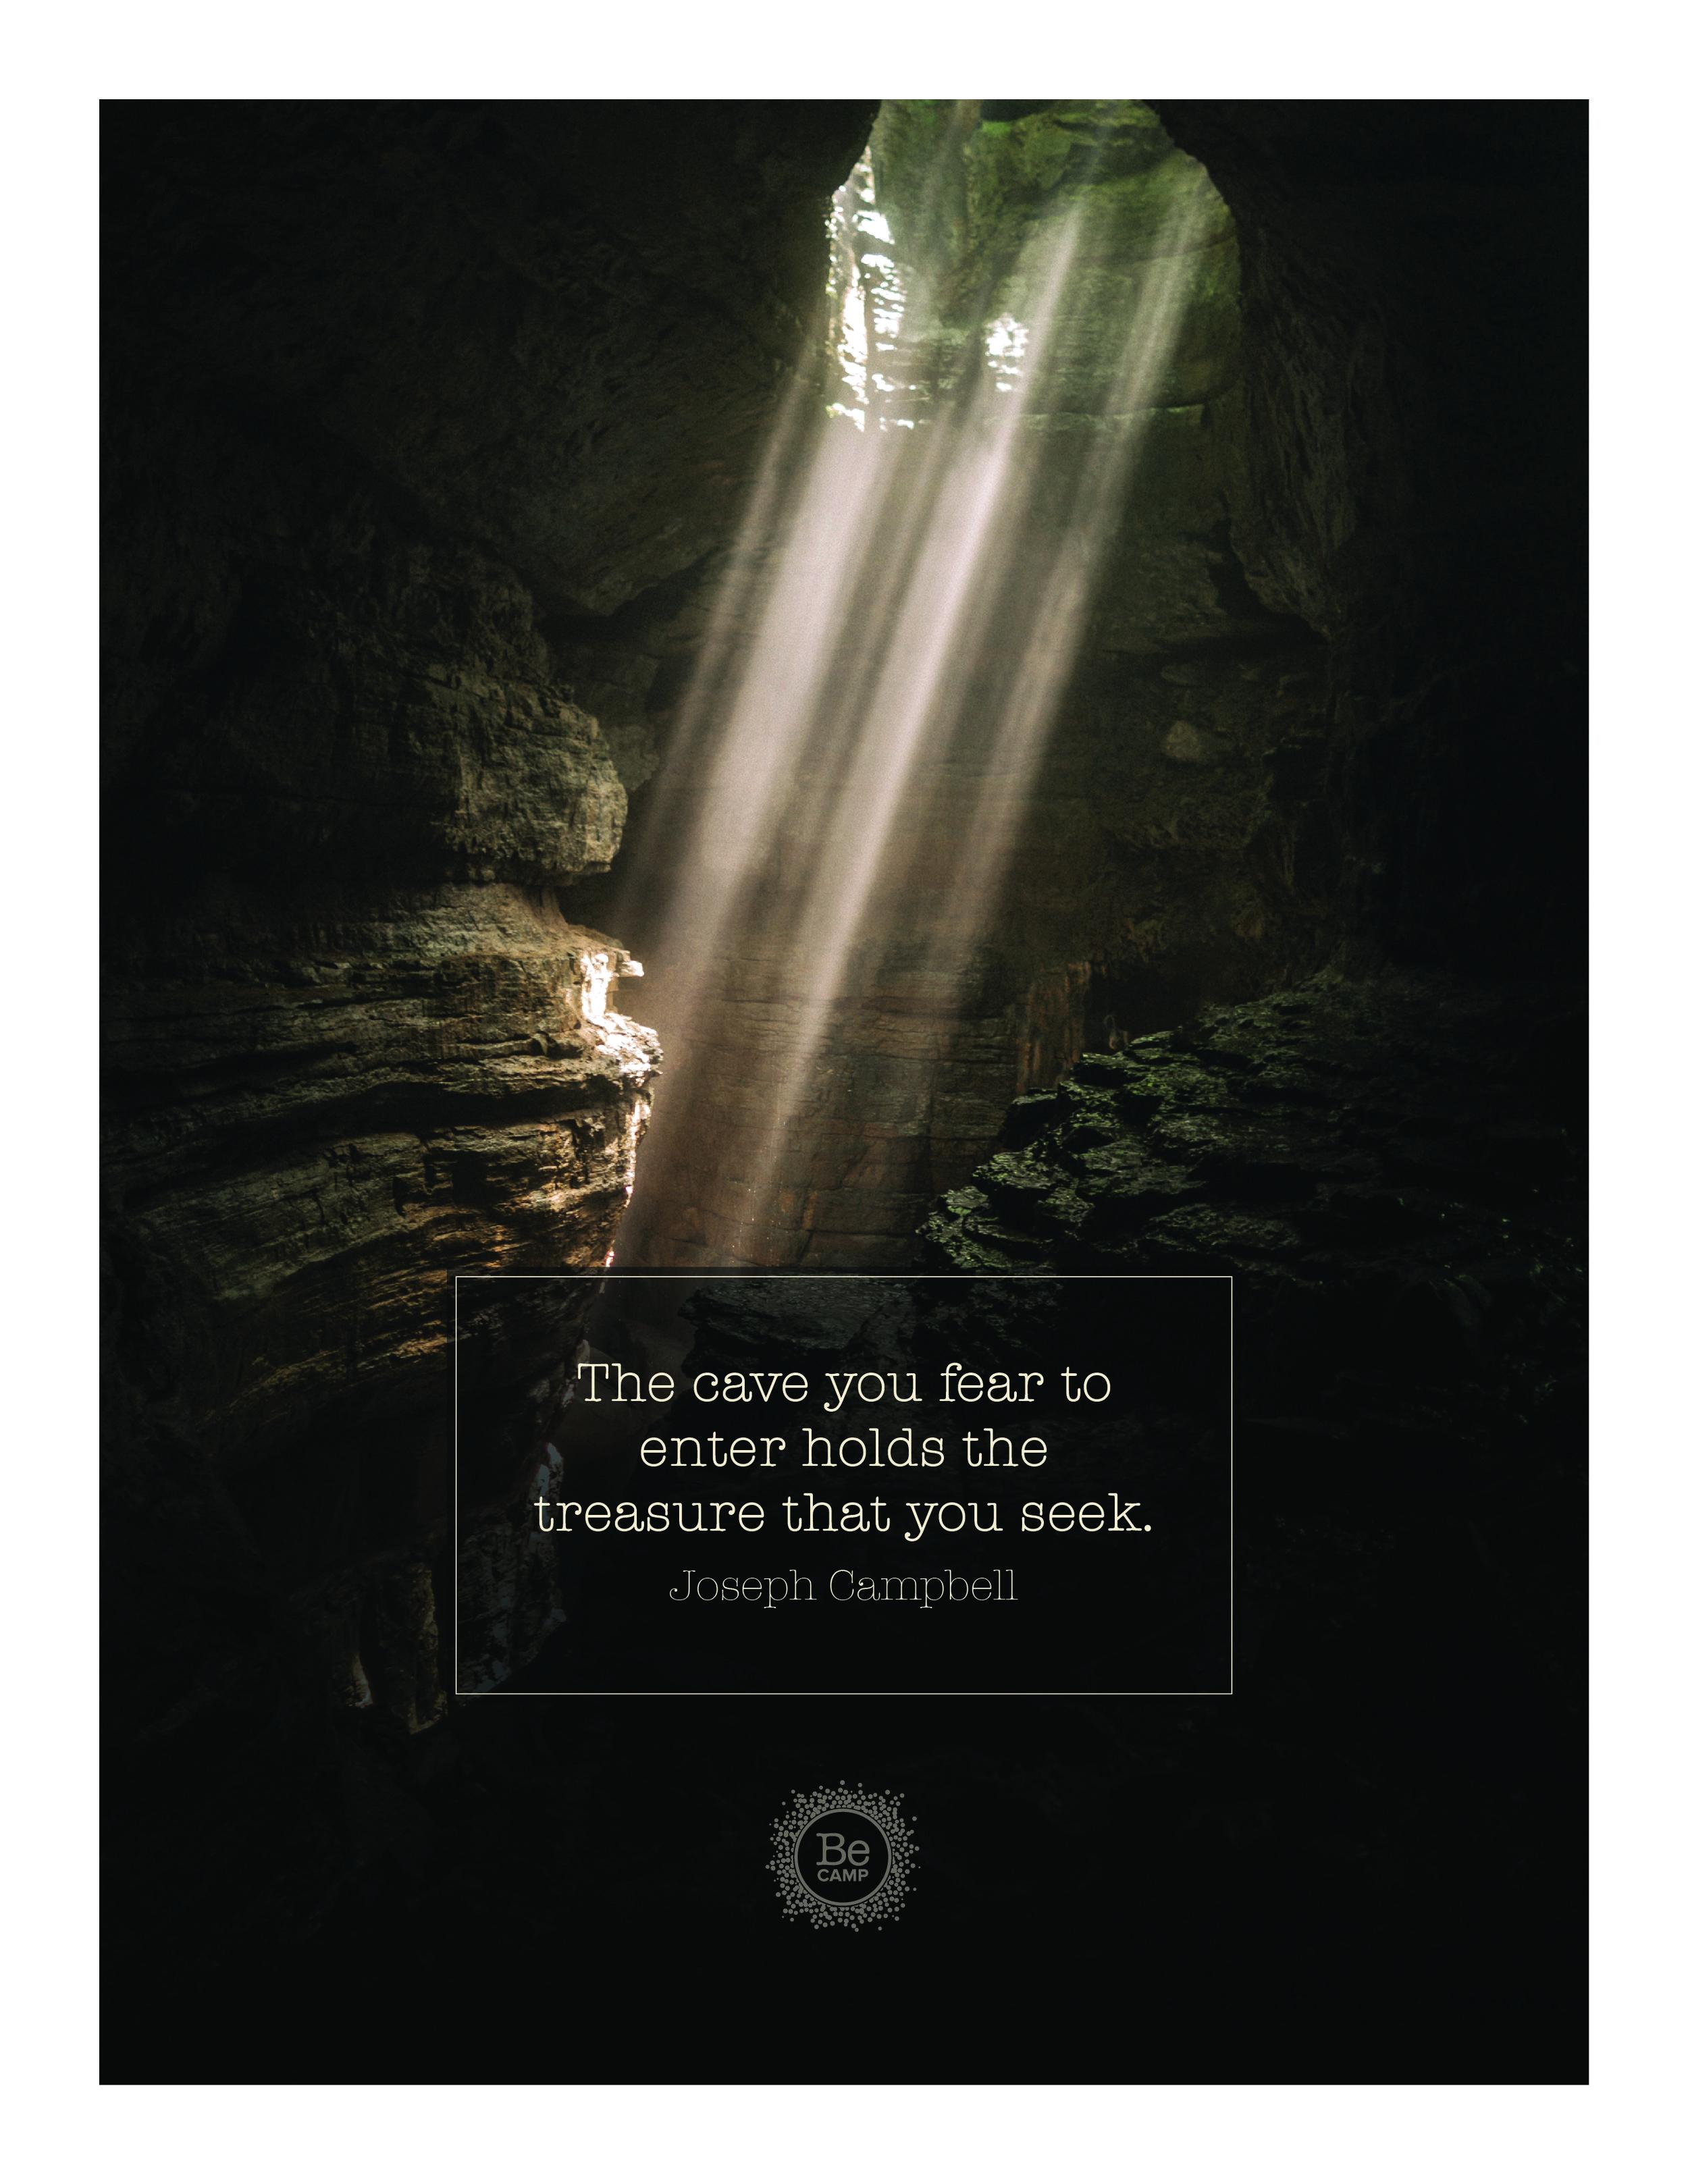 beCamp-cave-poster.jpg